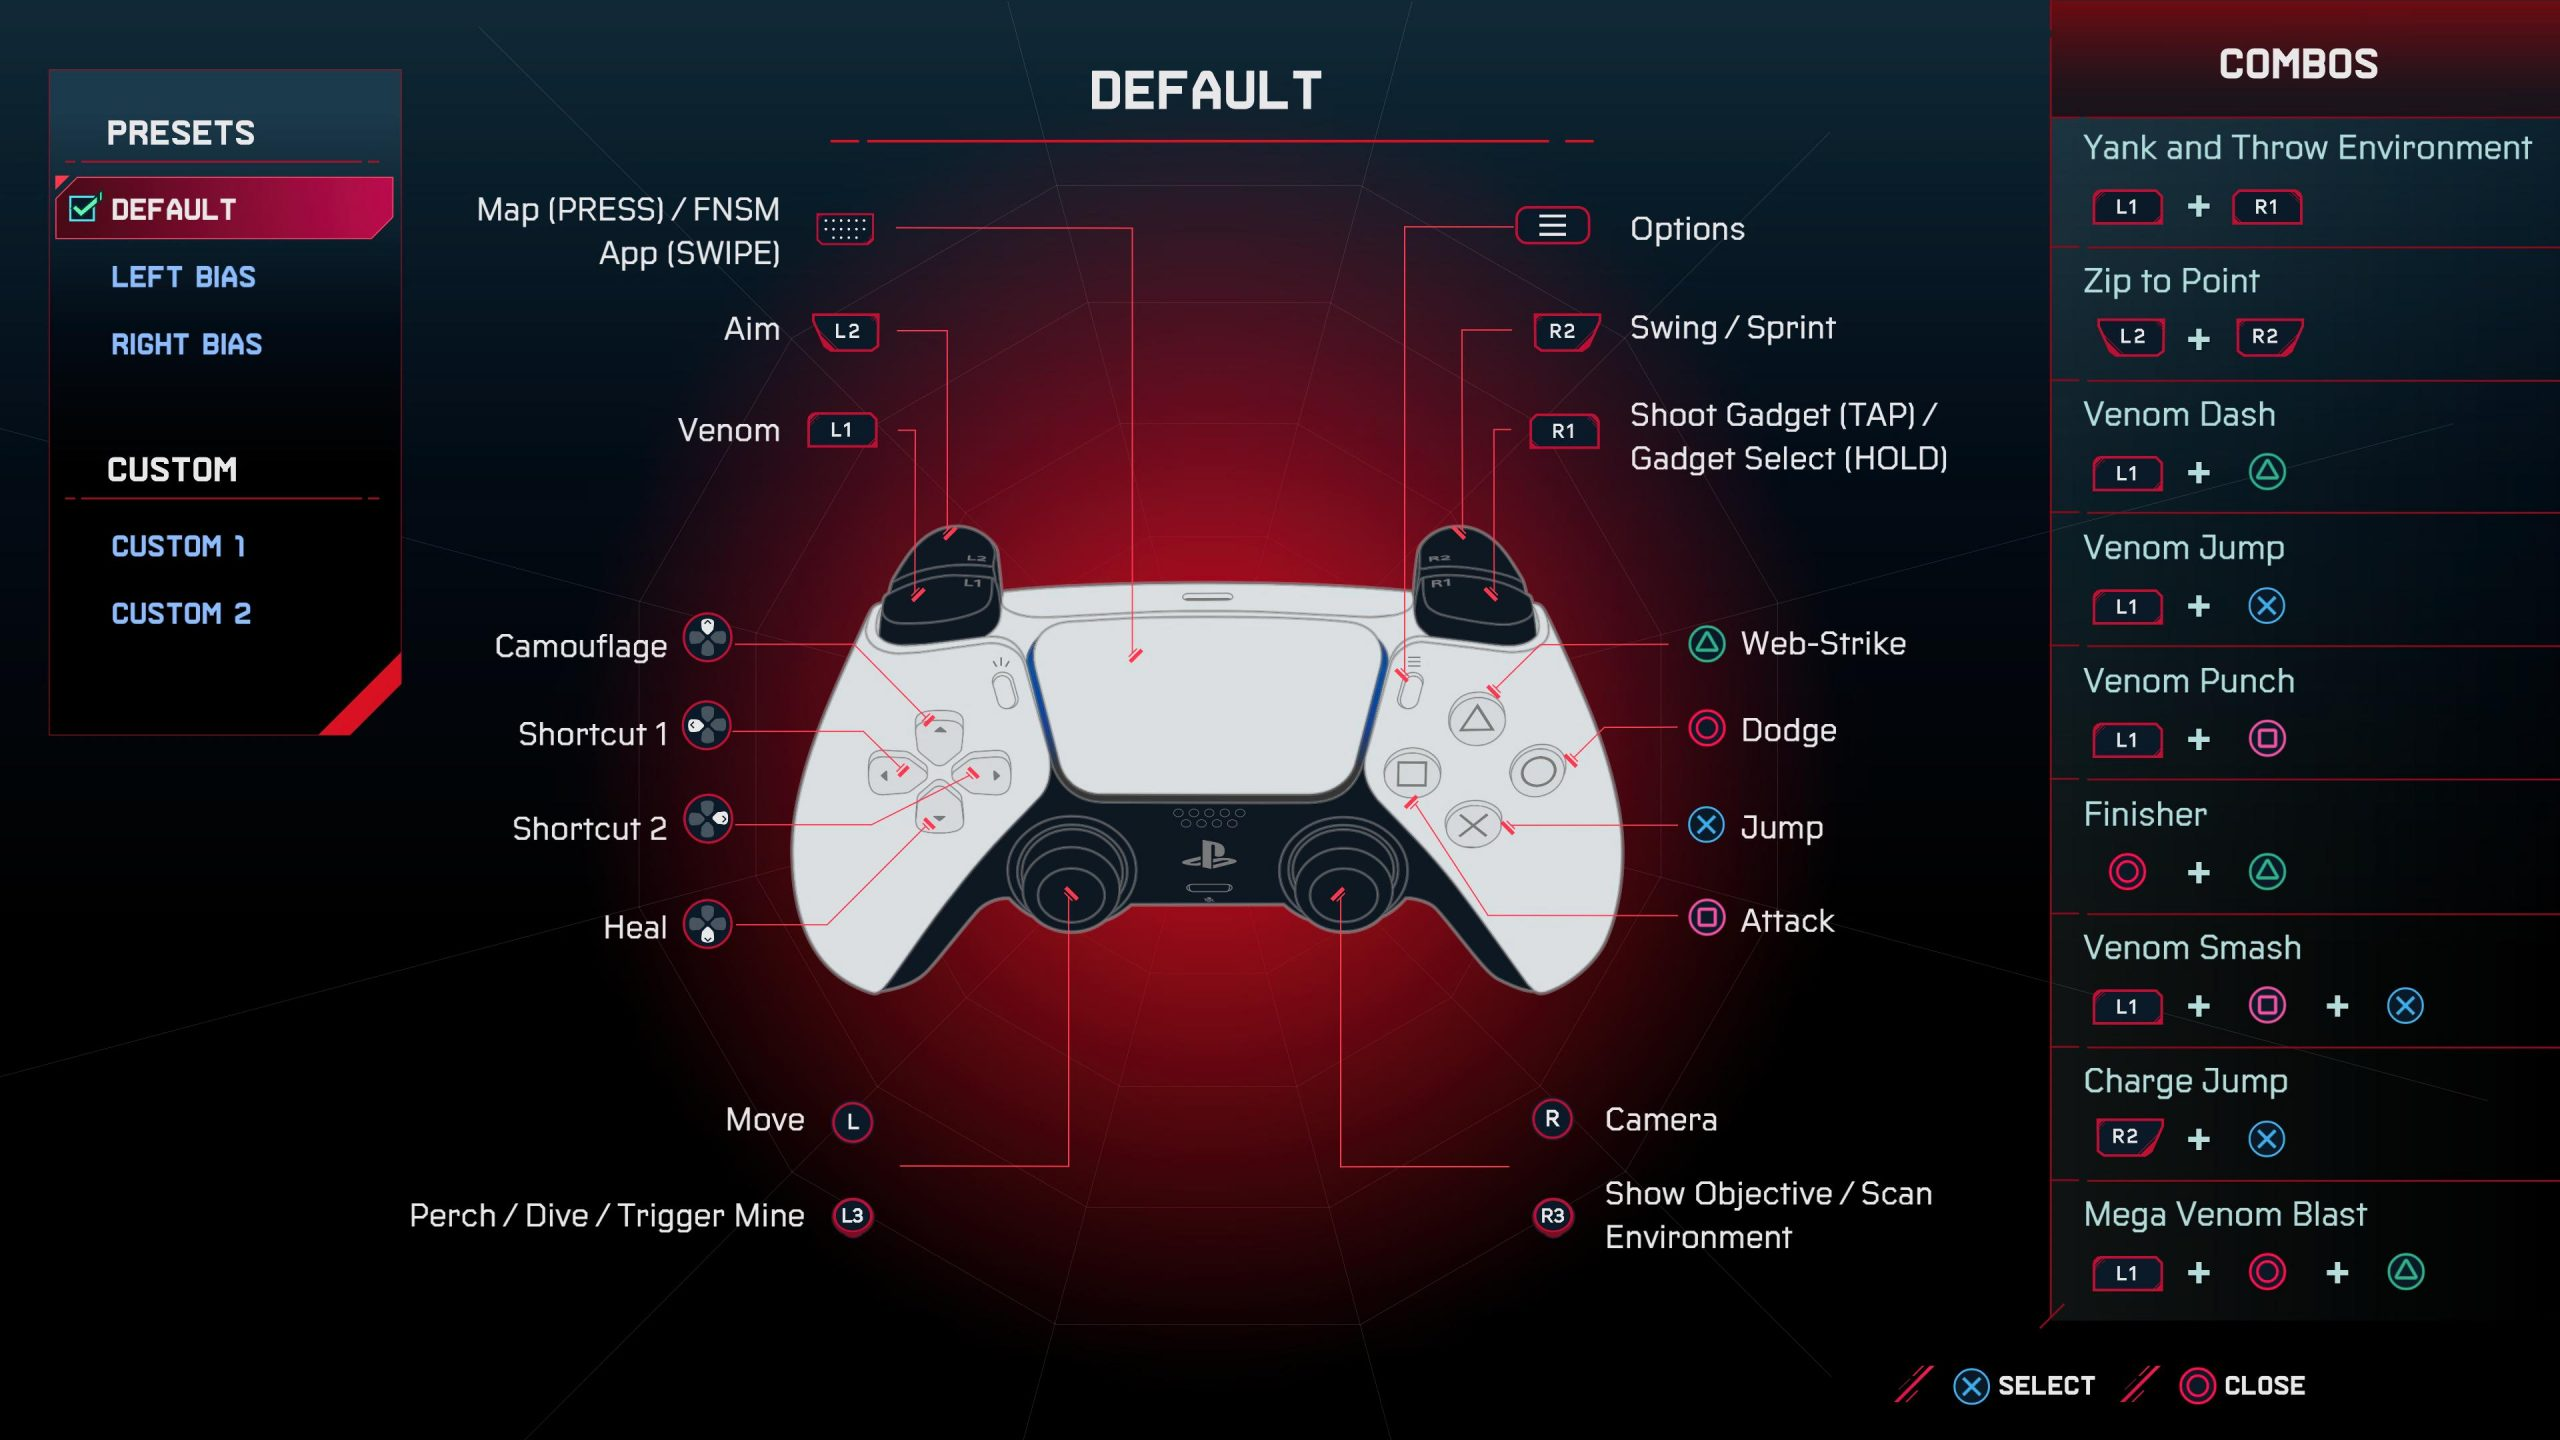 A screenshot showing the default controls